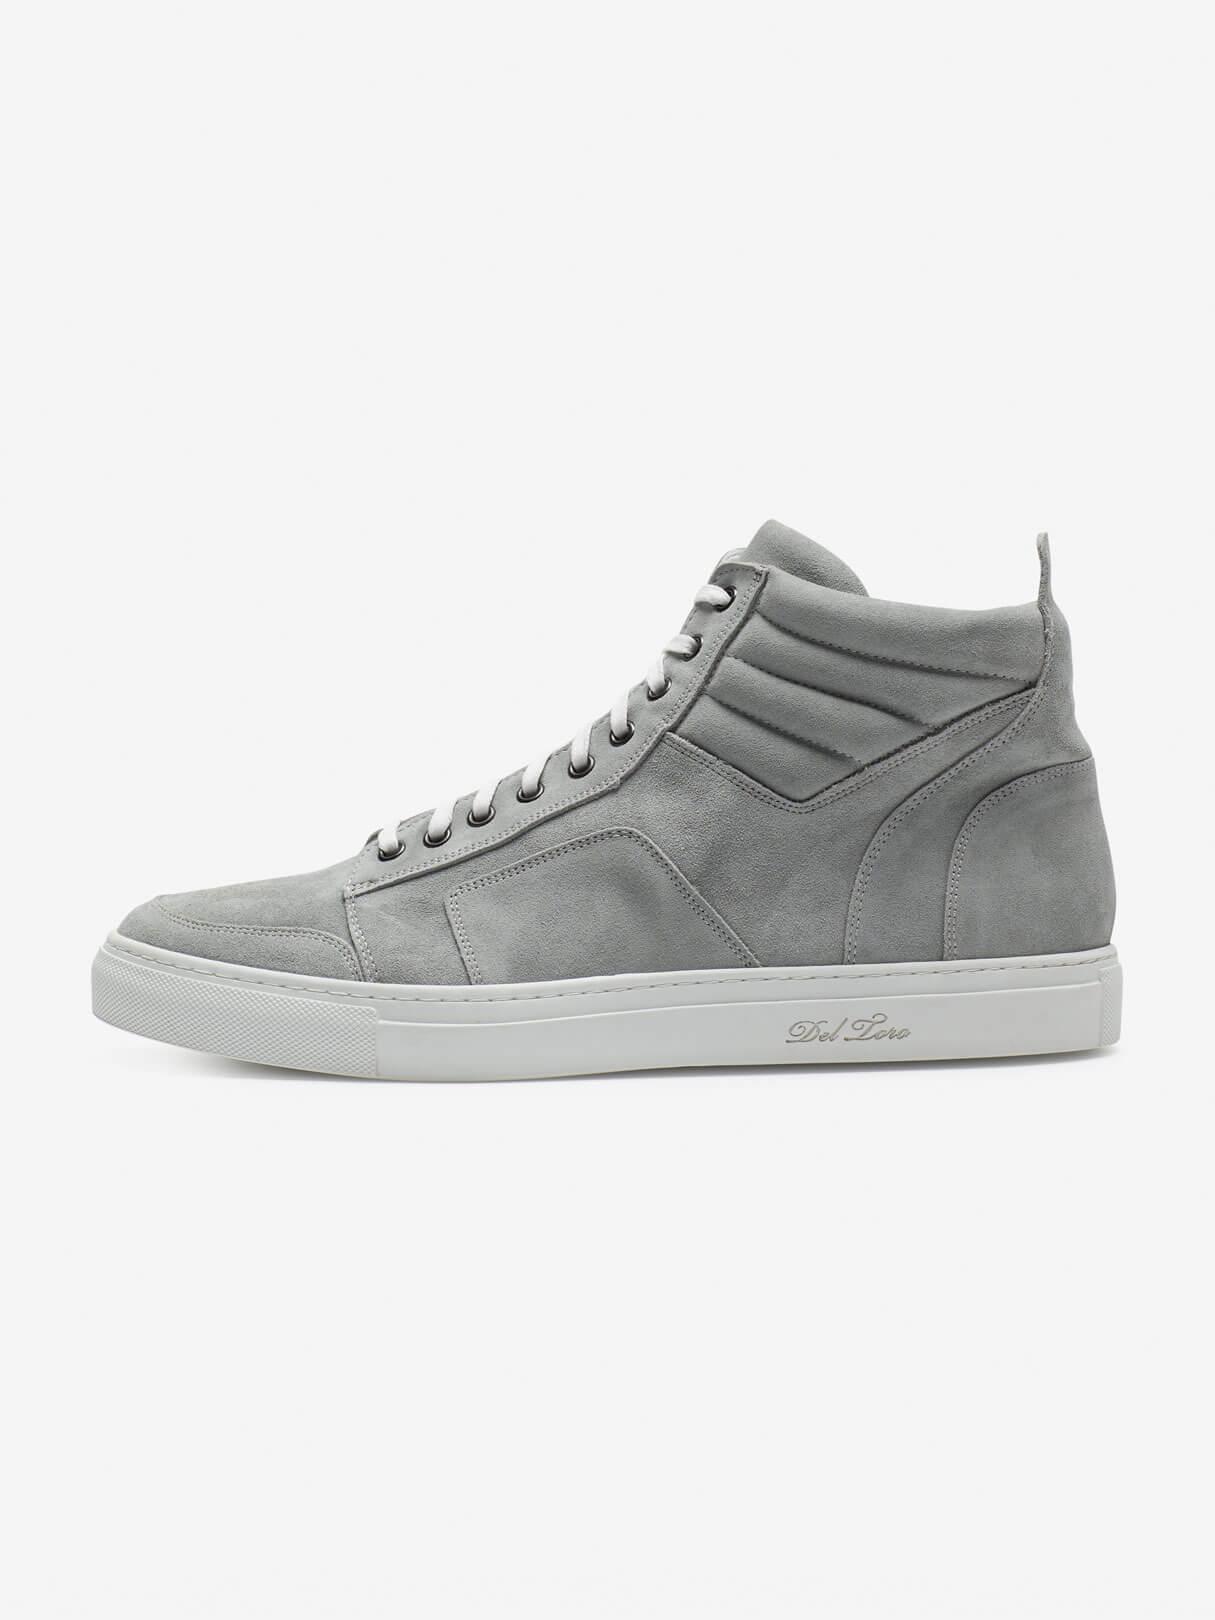 Del Toro Boxing Sneaker Grey Hero